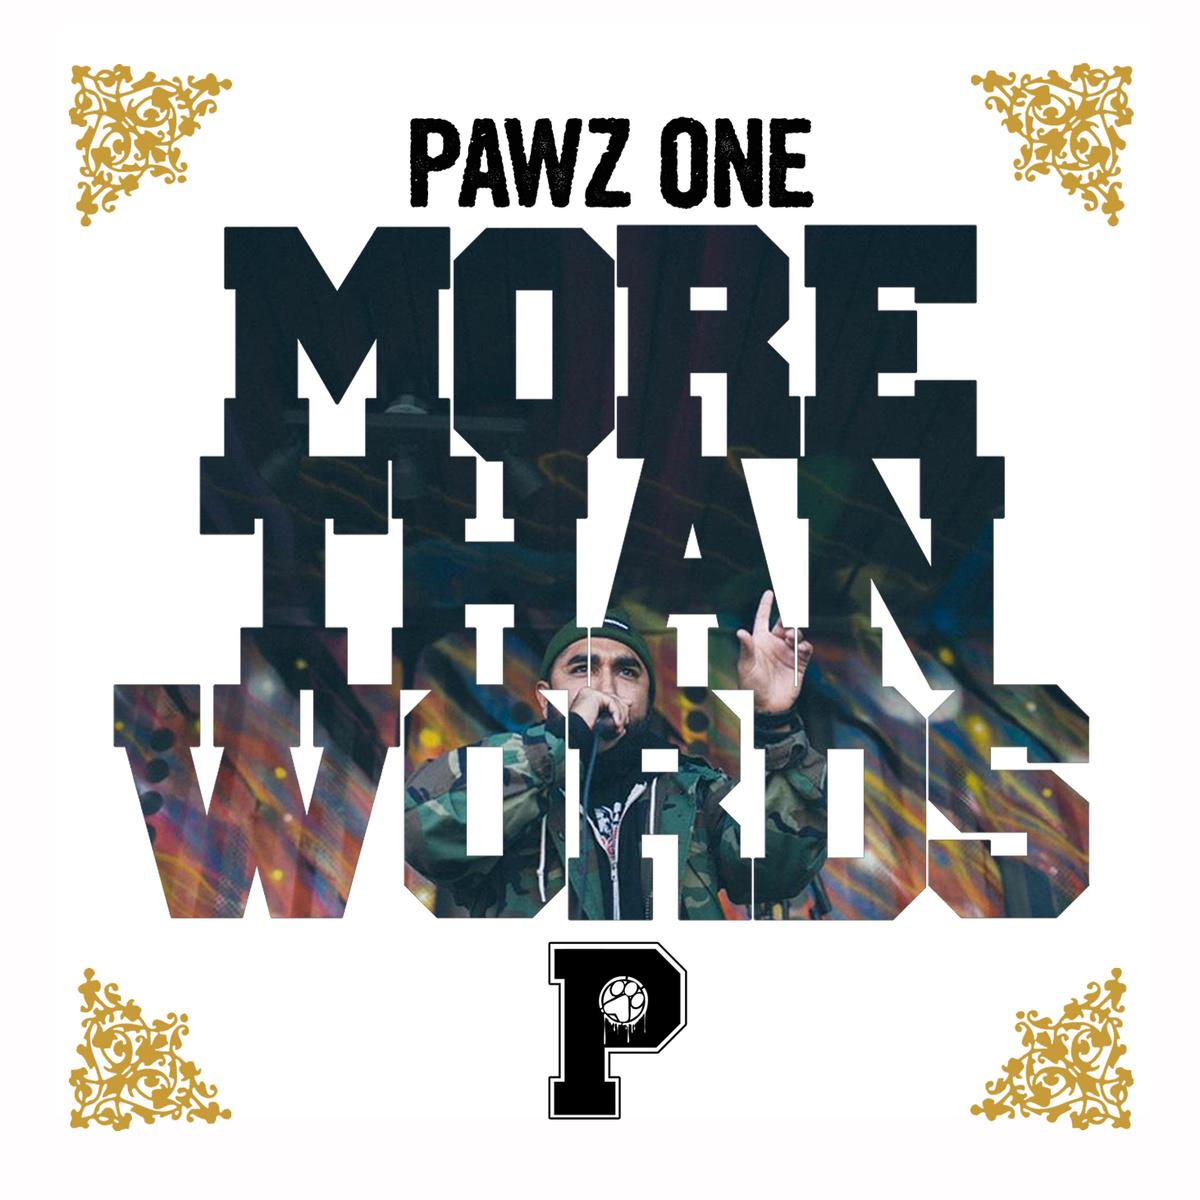 Morethanwords_pawzone